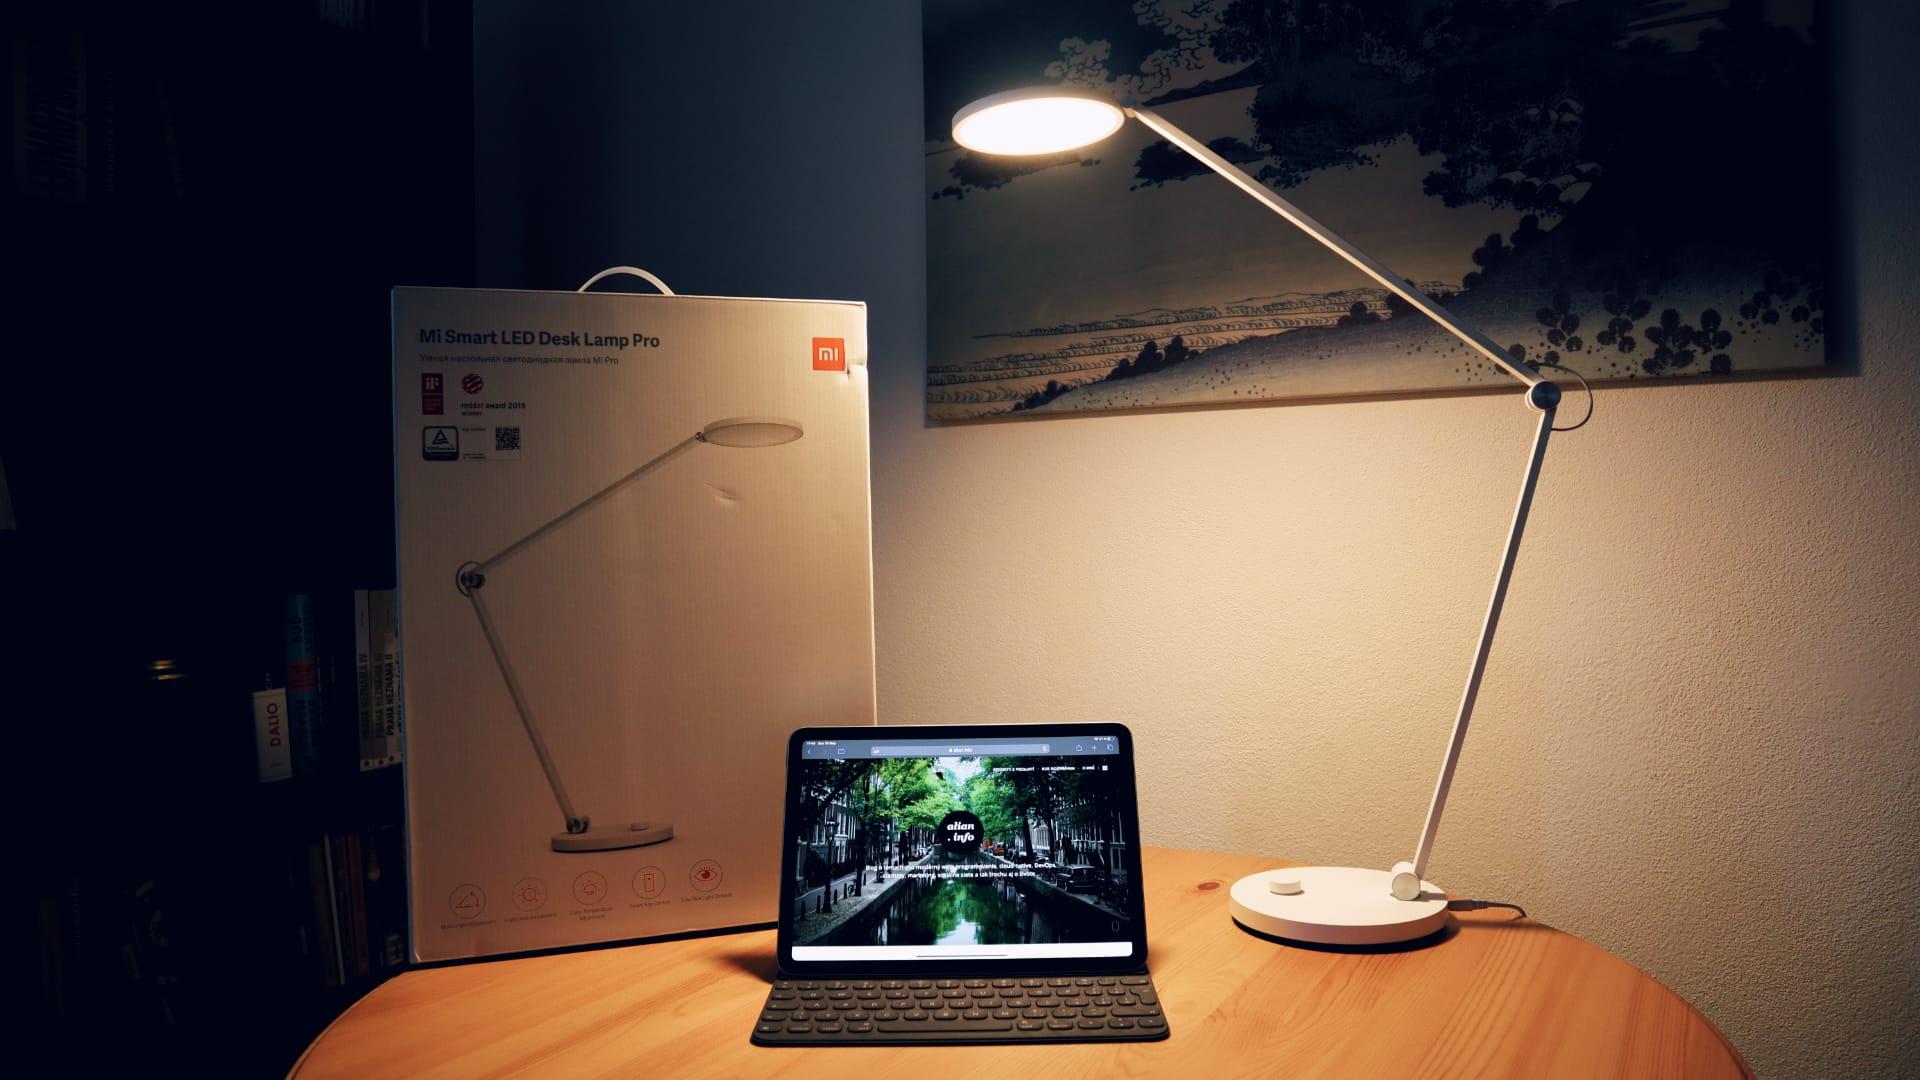 Recenzia Xiaomi Mi Smart LED Desk Lamp Pro | VLOG #92